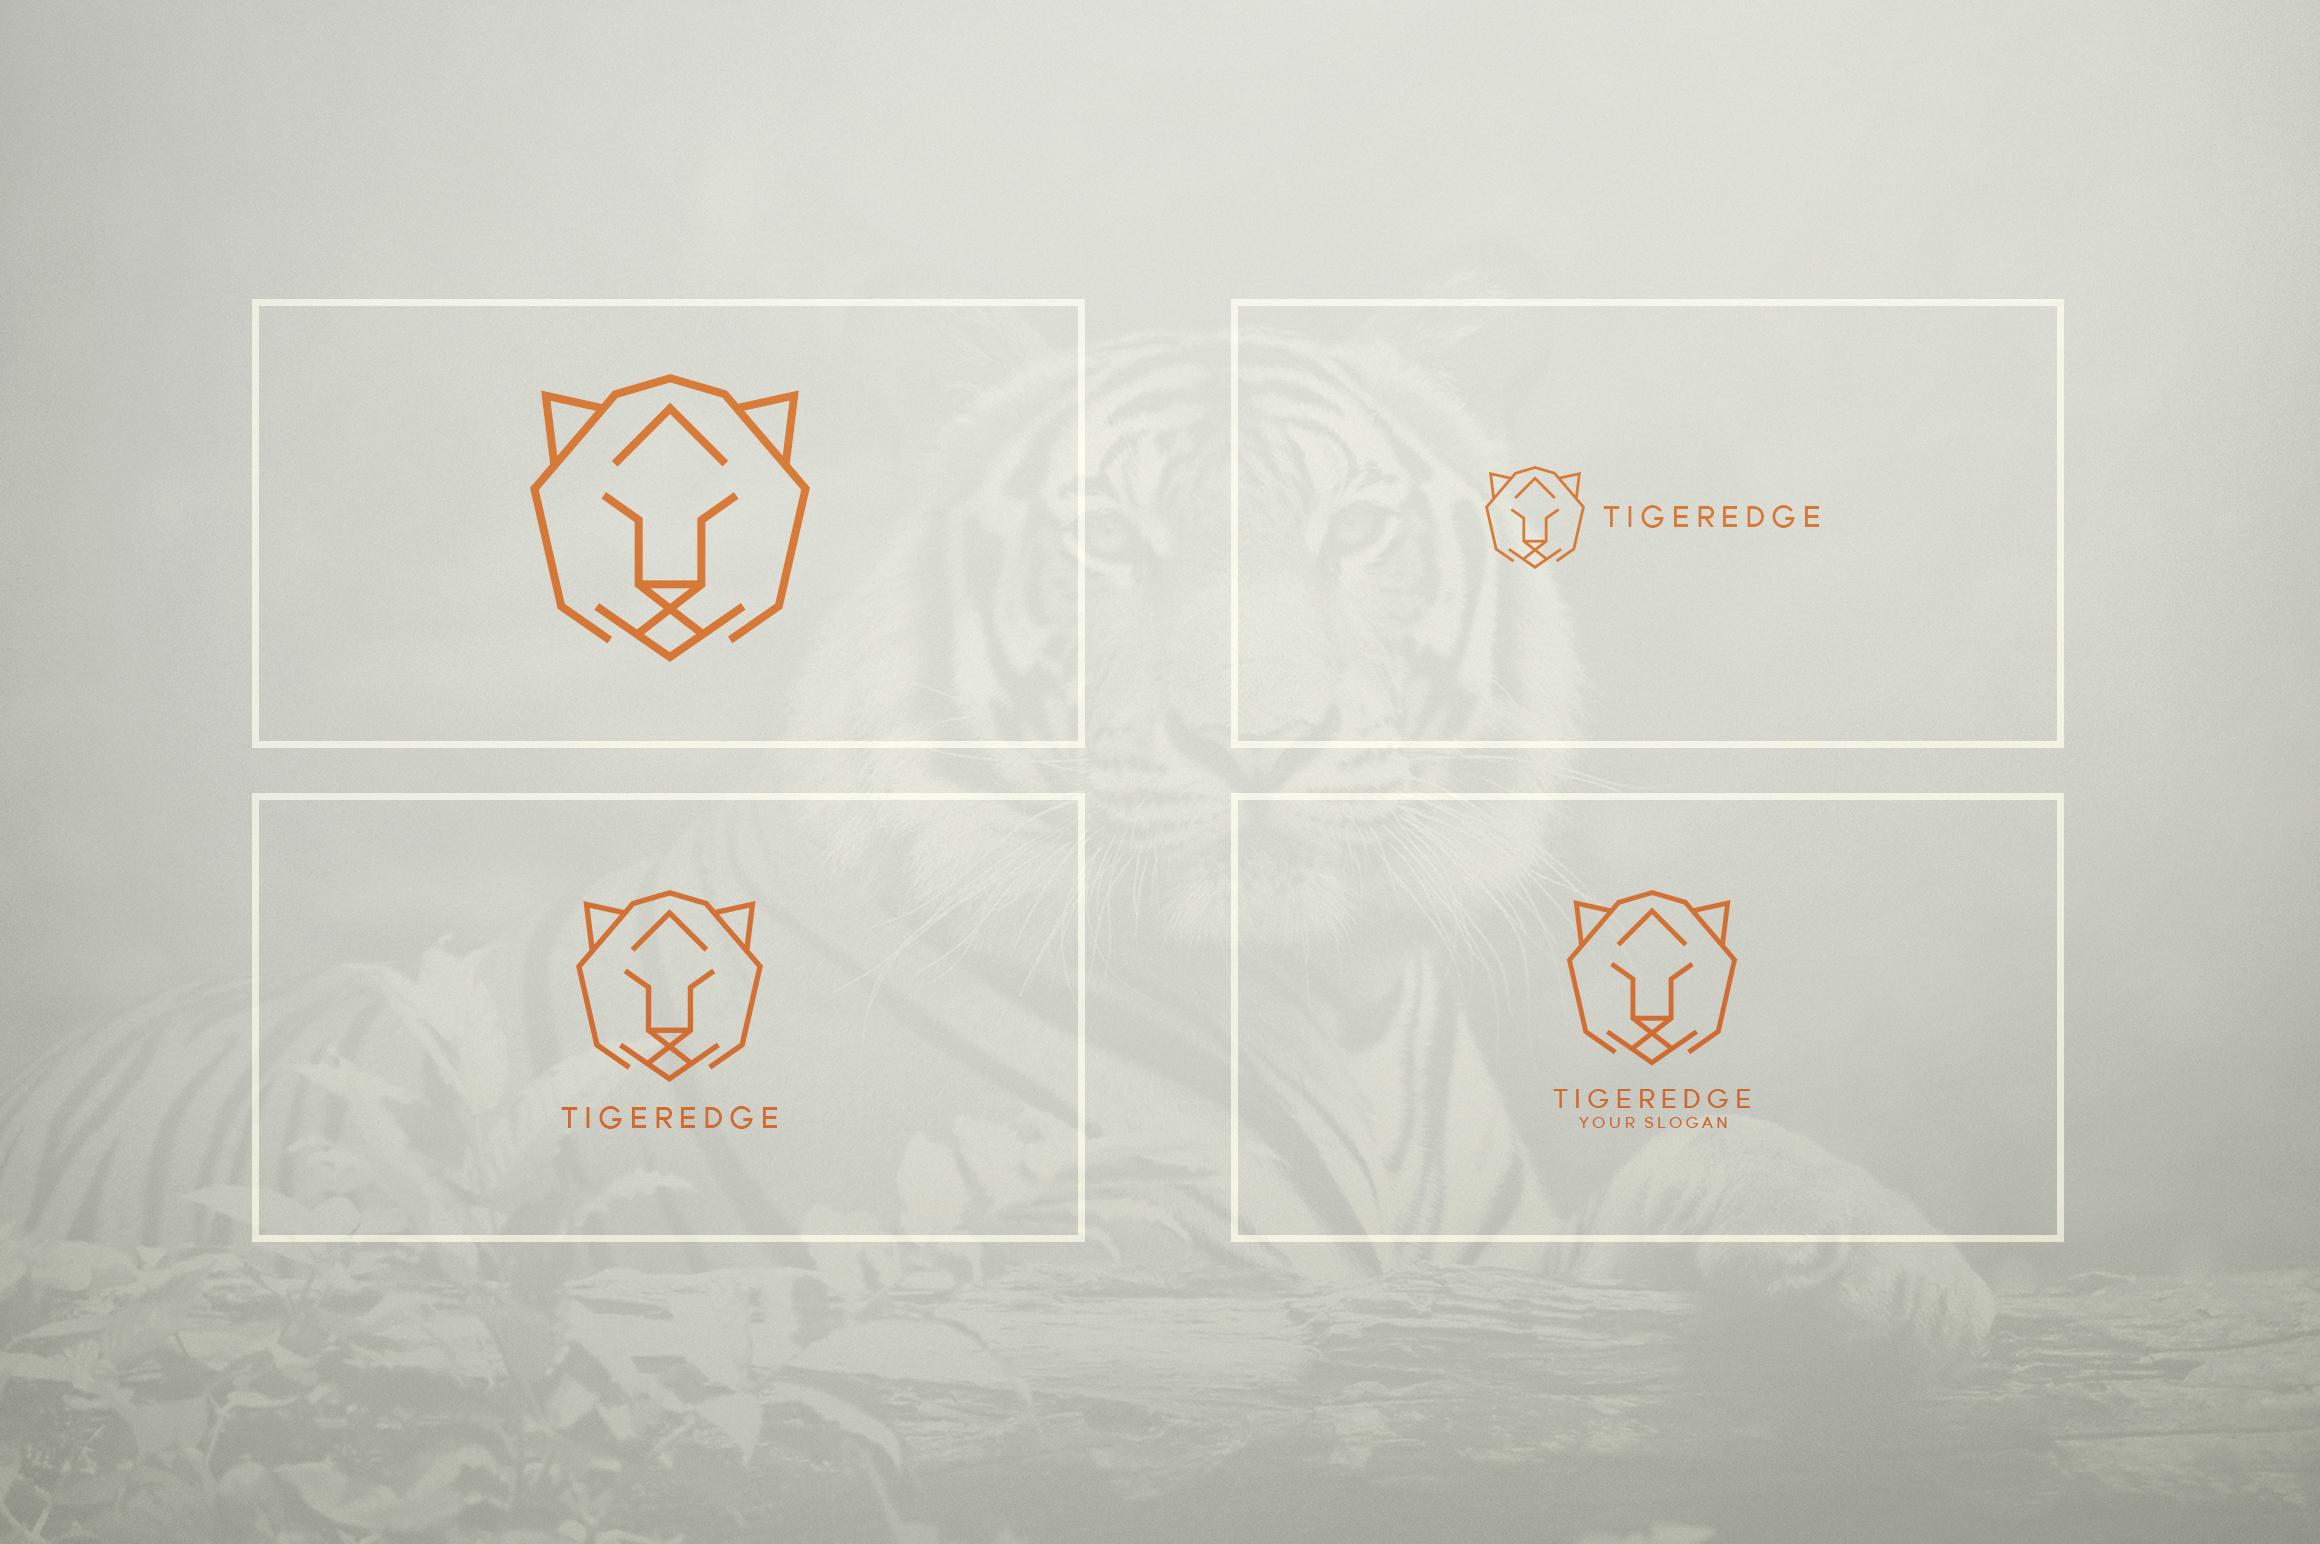 17 Geometric Animal Icons and Logos example image 10